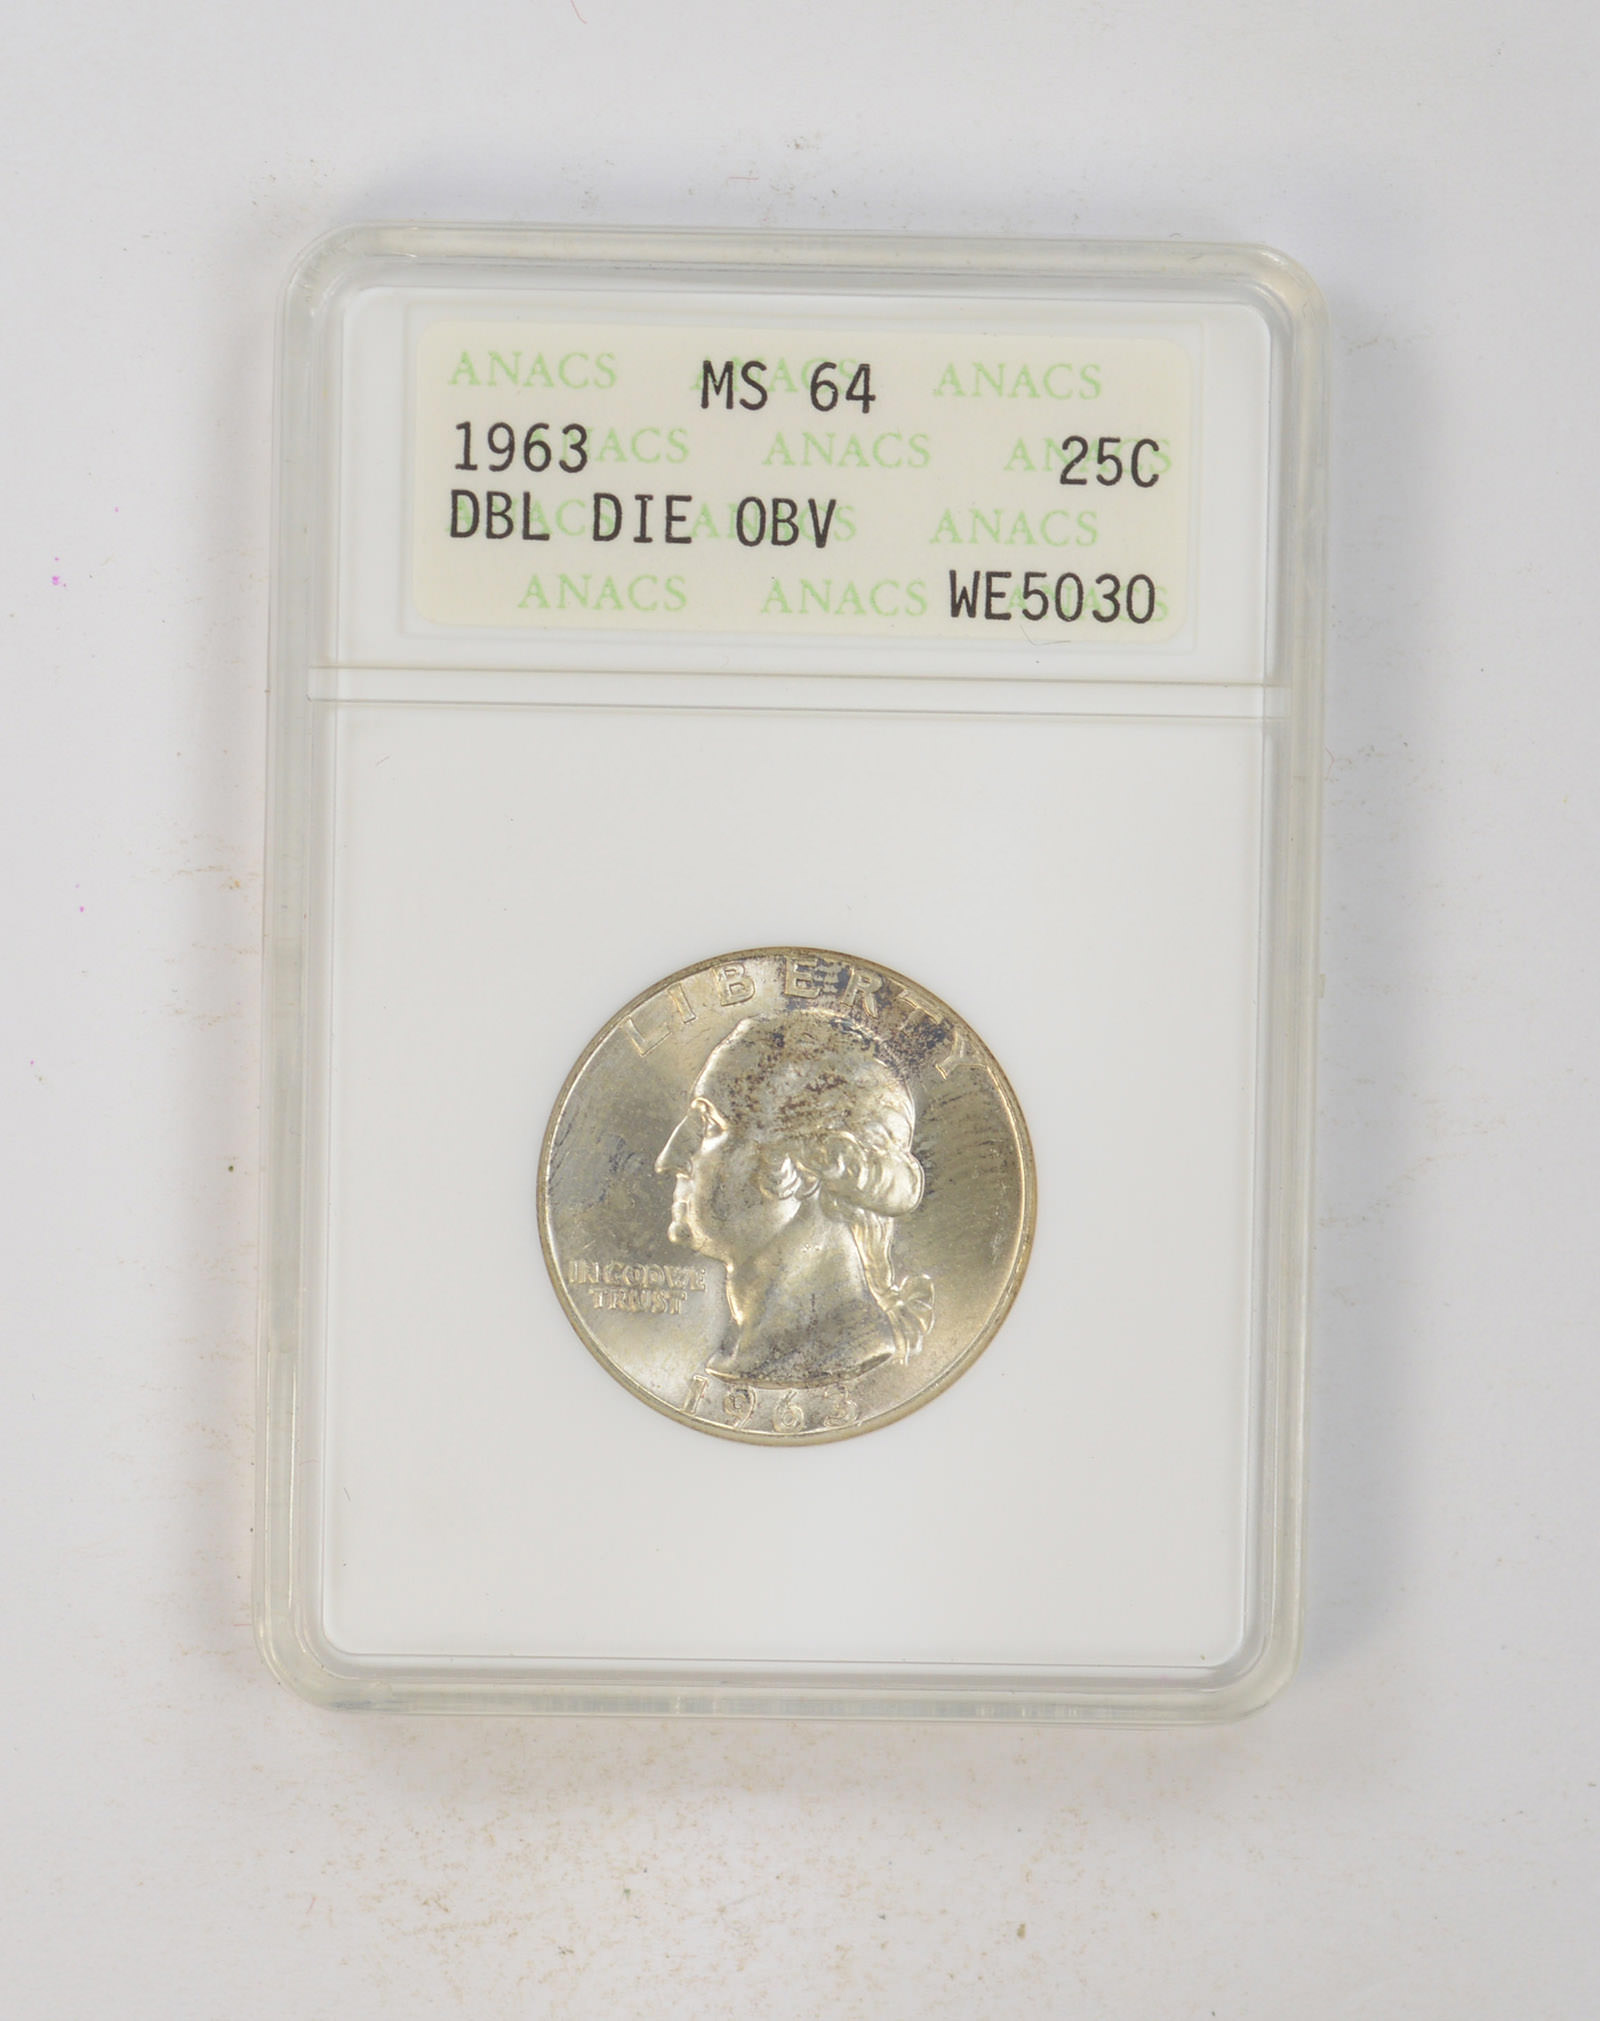 MS64 1963 Washington Quarter - Double Die Obverse - ANACS Graded